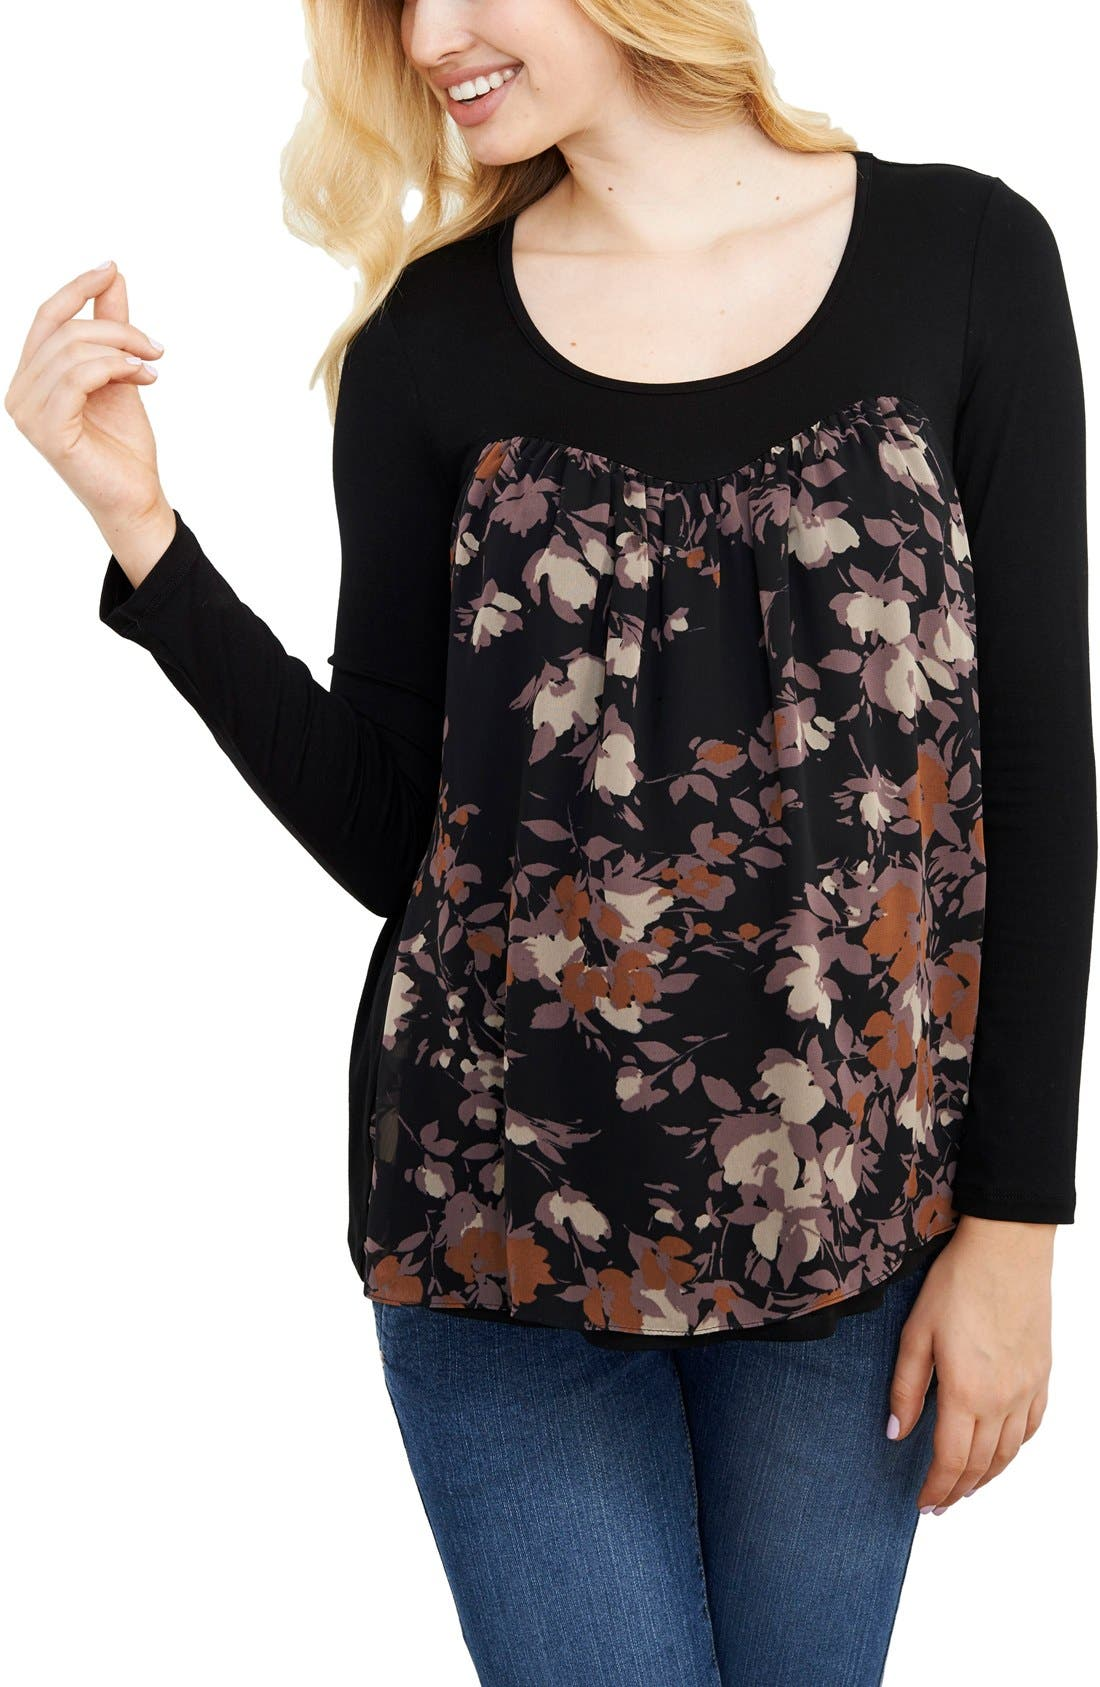 Chiffon Knit Maternity Top,                         Main,                         color, Black/ Lilac Floral Print